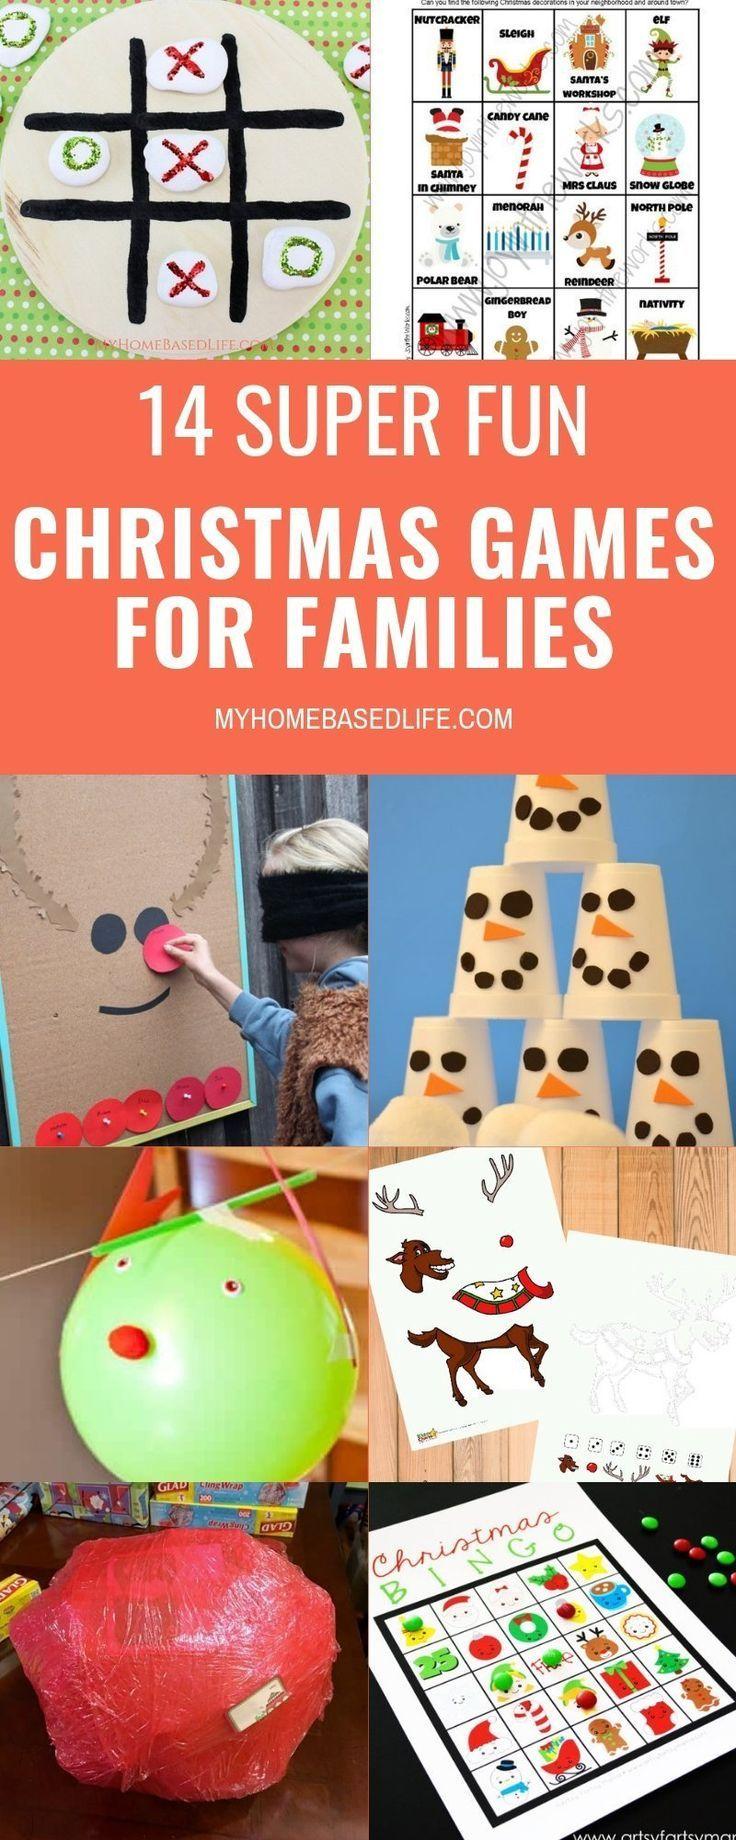 Christmas Games for Families | My Home Based Life